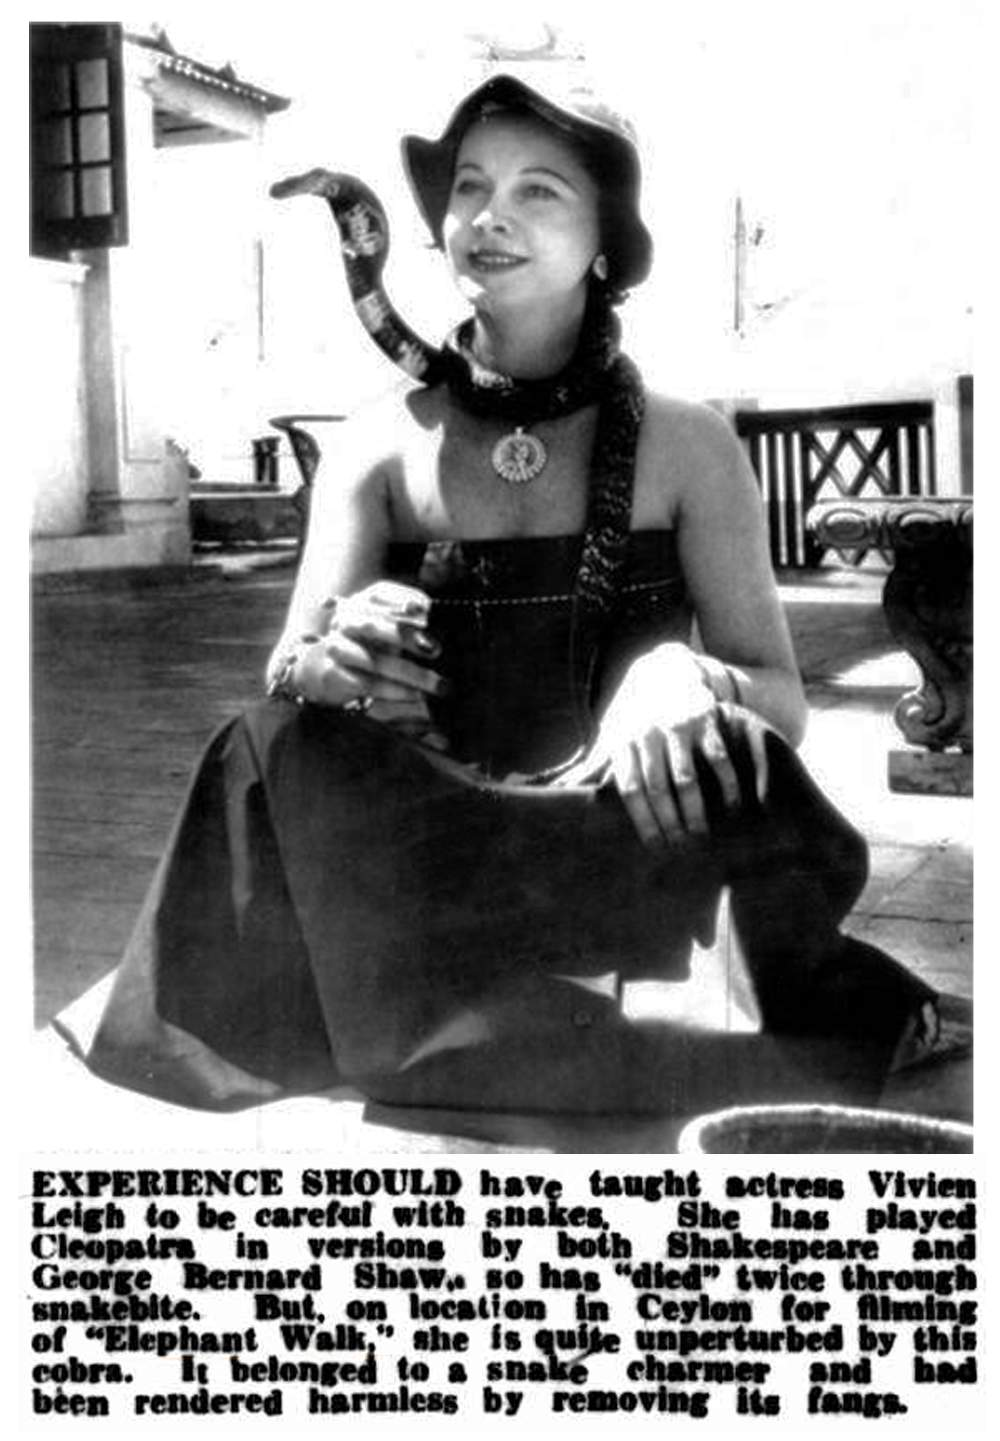 Vivien+Leigh+Cobra.jpg